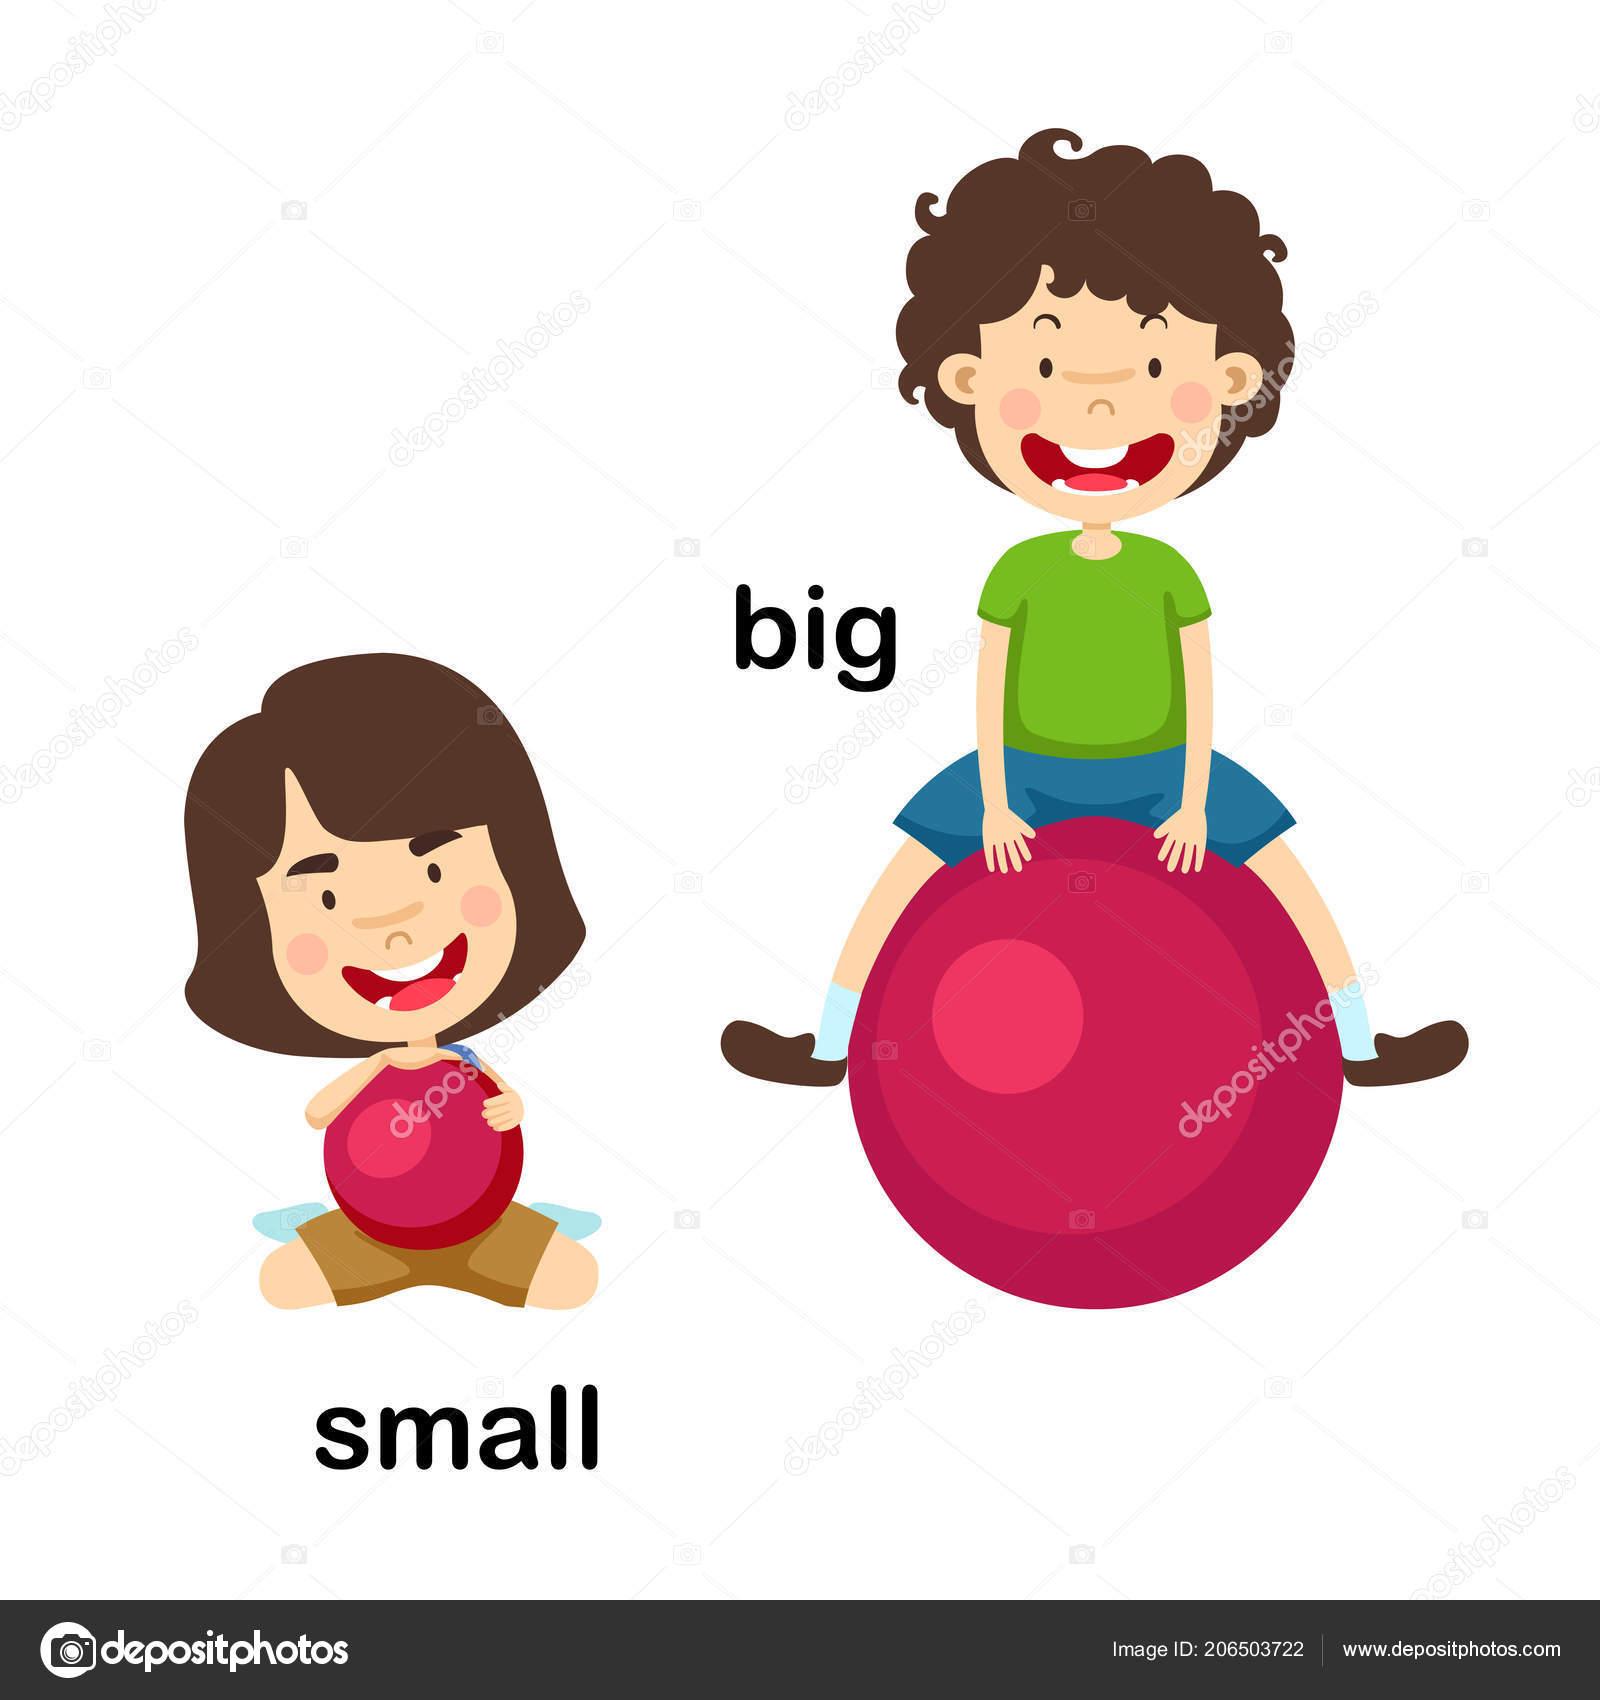 33e20d235a6a Big Small Vector Illustration — Stock Vector © jehsomwang #206503722